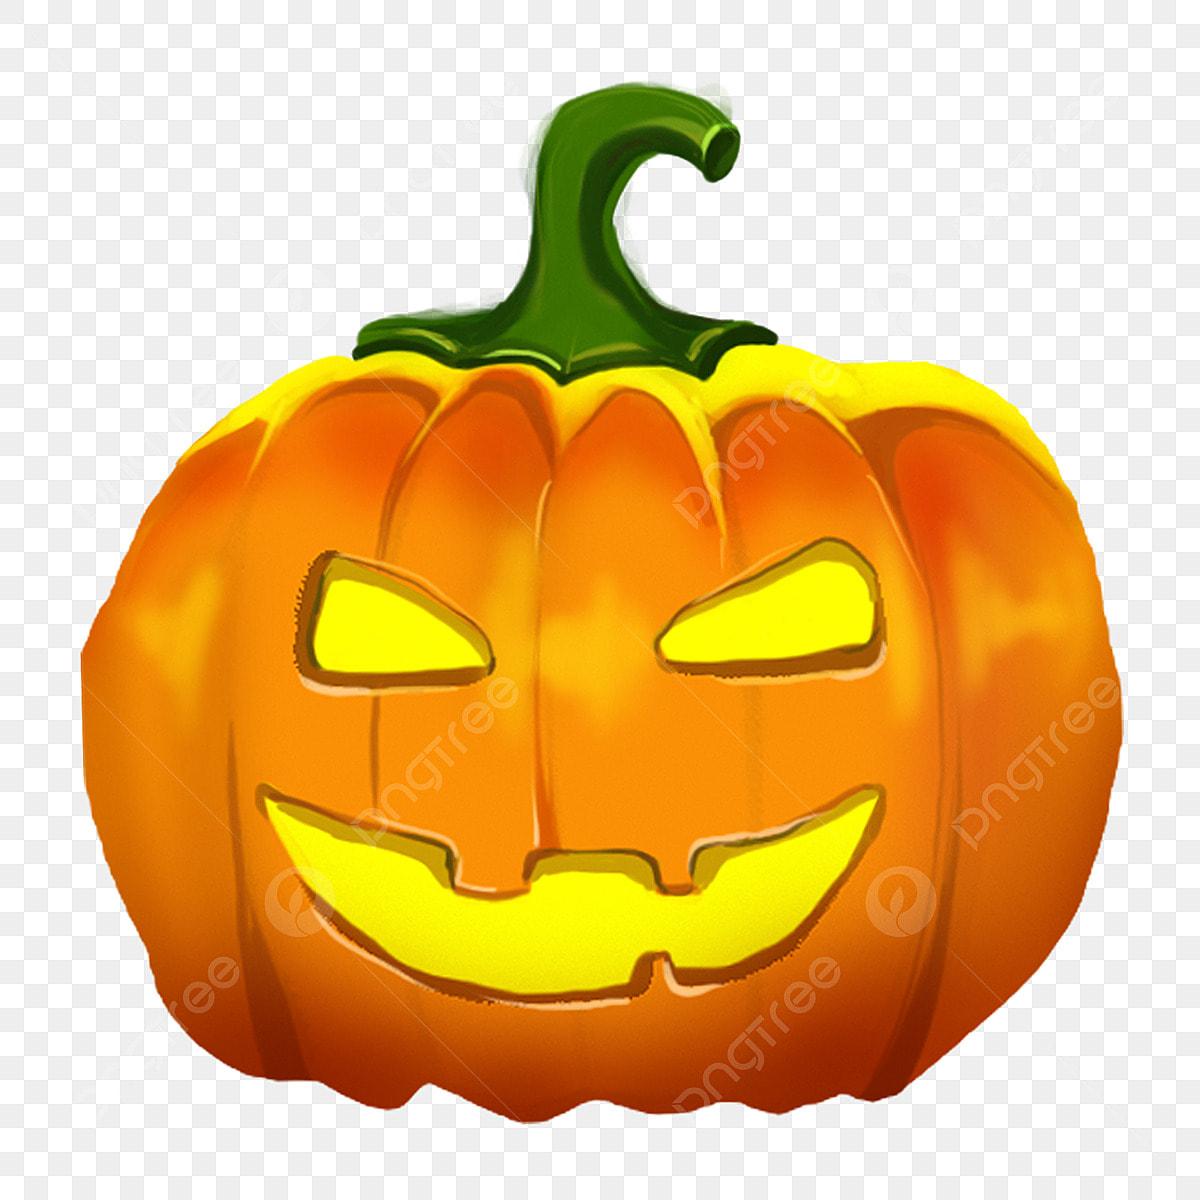 Halloween Pumpkin Png Clipart.Expression Pumpkin Lantern Halloween Pumpkin Halloween